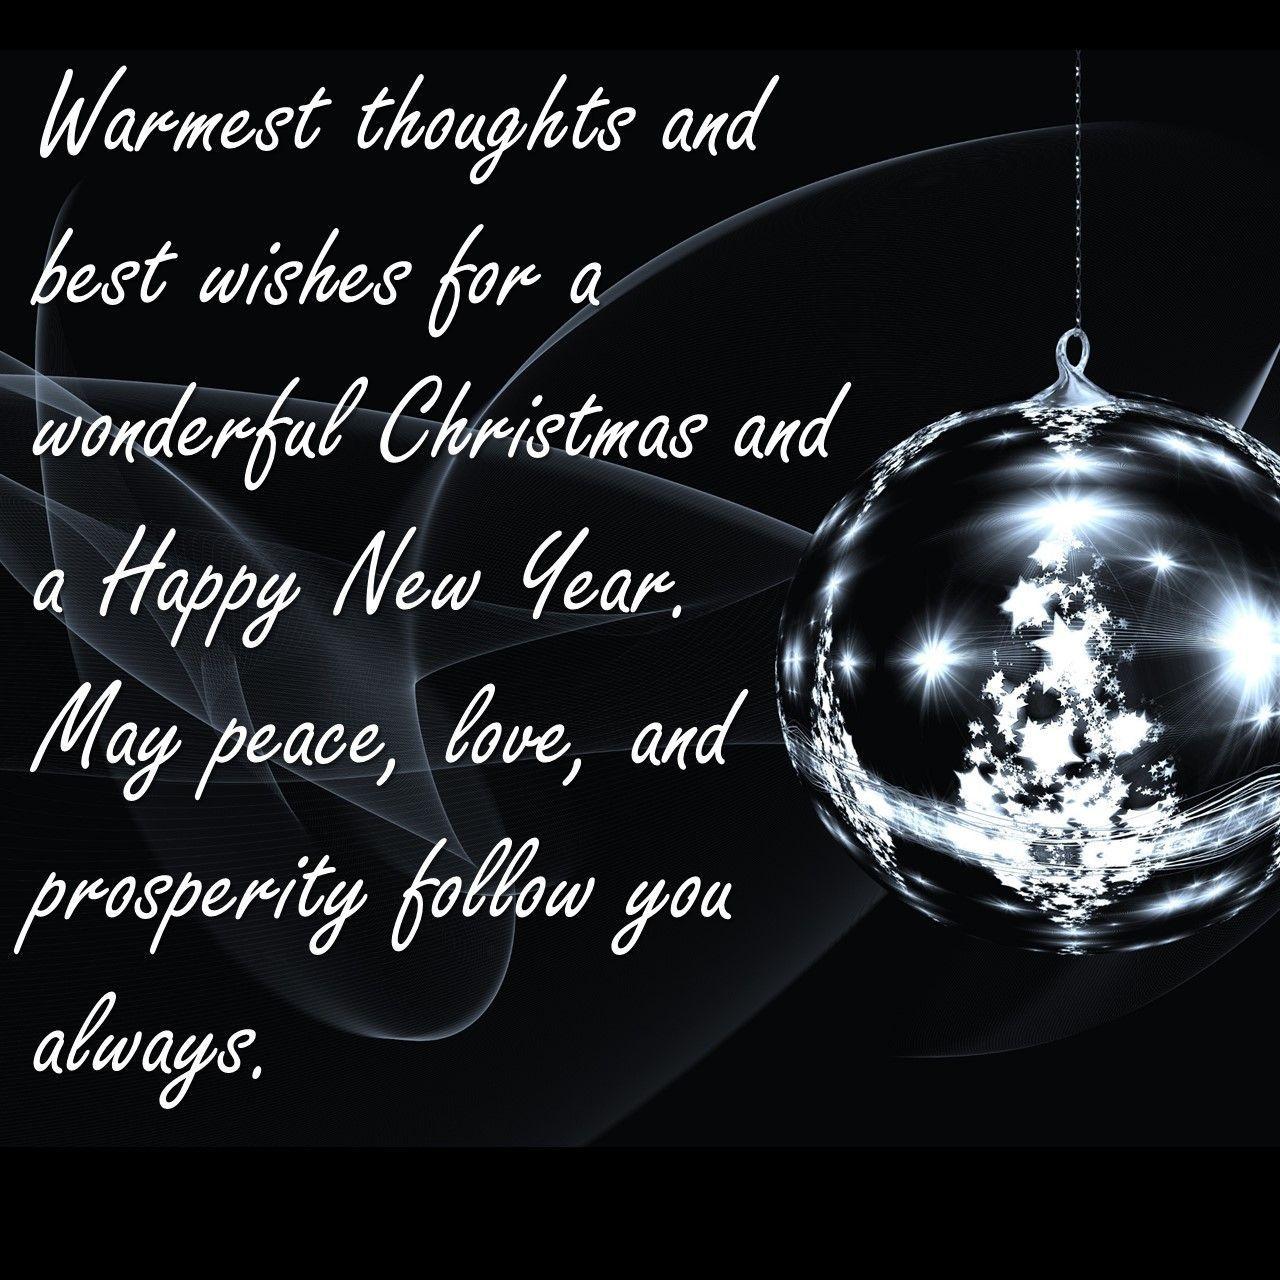 Christmas Messages Video Christmas Greetings Messages Christmas Wishes Messages Christmas Quotes